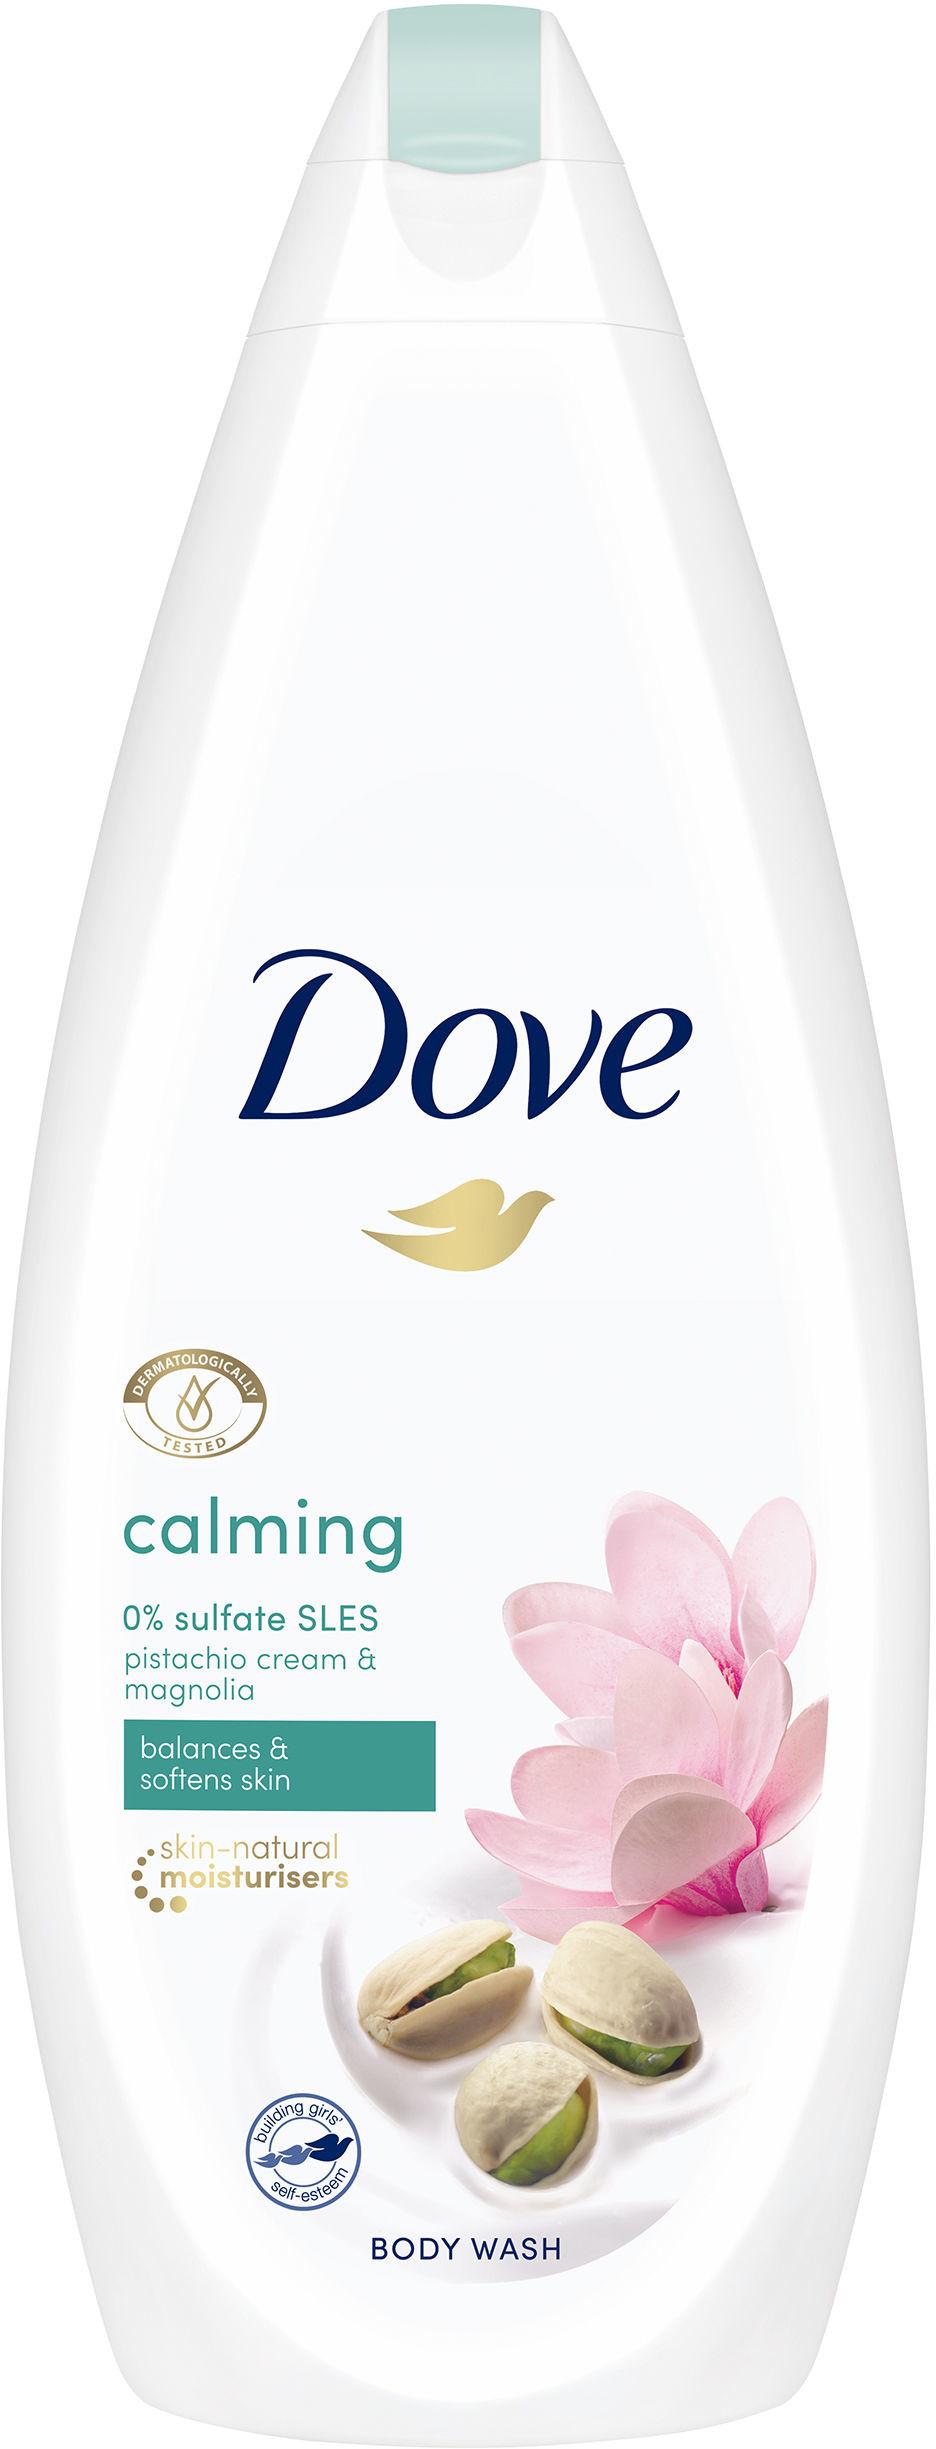 Dove Żel Pod Prysznic Calming Pistacja i magnolia 500 ml 8712561645690